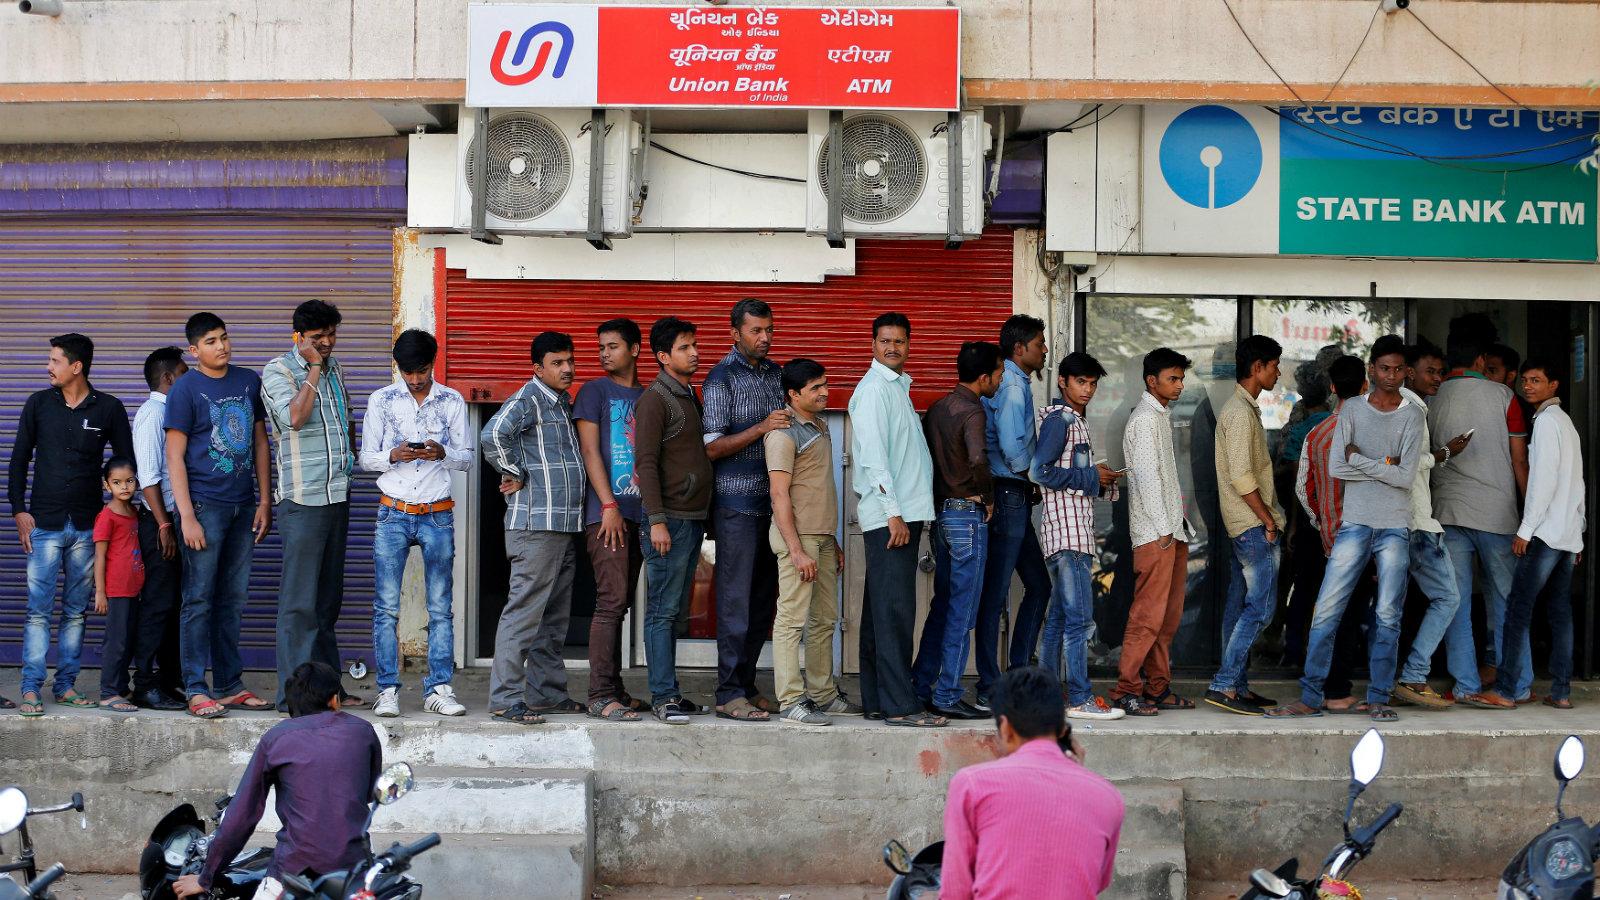 Modi's former chief economist explains why demonetisation was popular despite the pain